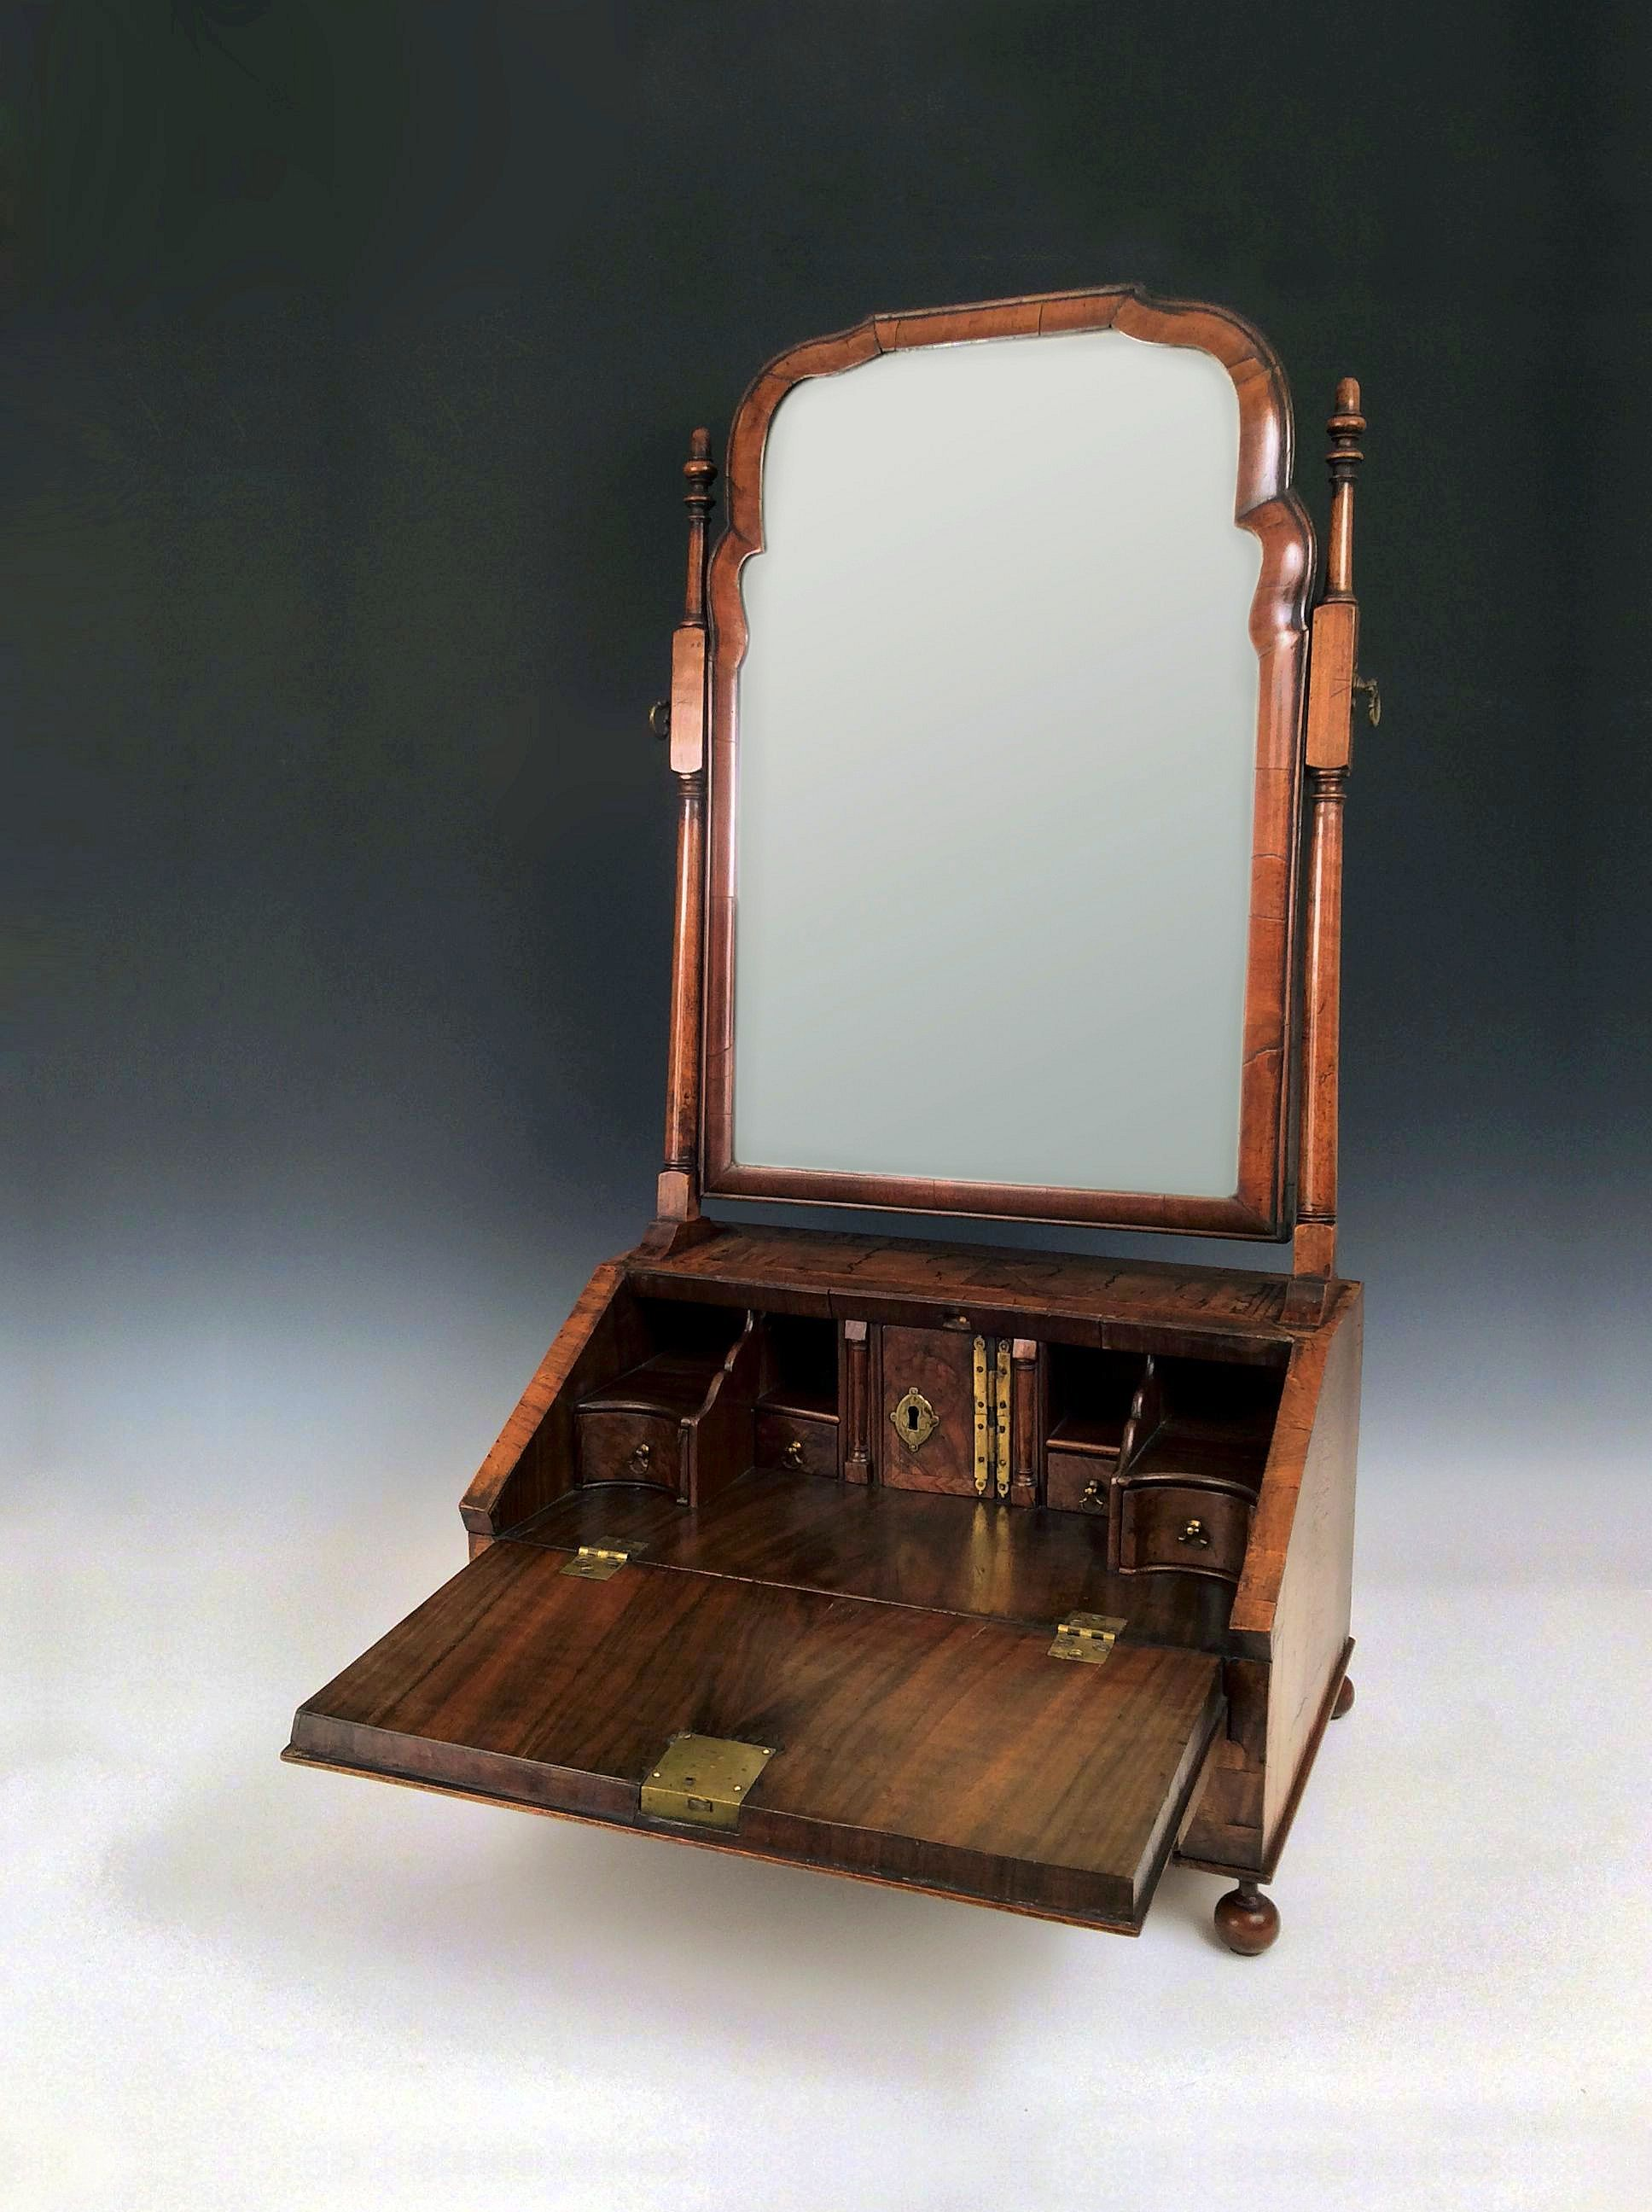 Rare antique queen anne walnut table bureau dressing mirror for Bureau with mirror